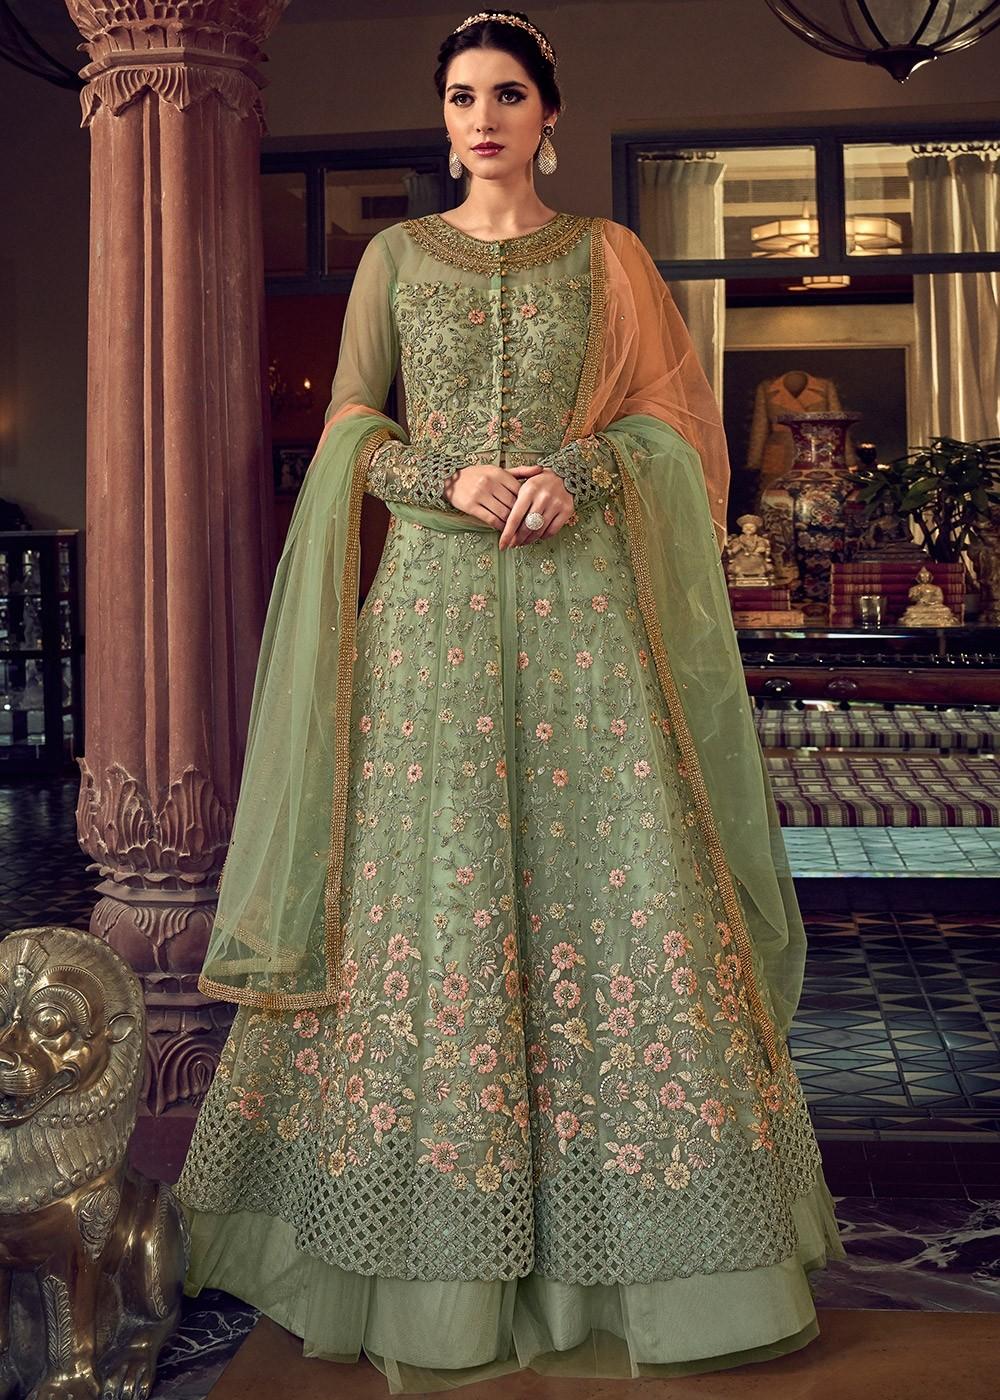 Party Wear Readymade Valentine Special New Magenta Floral Beaded Women/'s Art Silk Saree Blouse Sari Indian Choli Shirt Sleeveless Round Neck